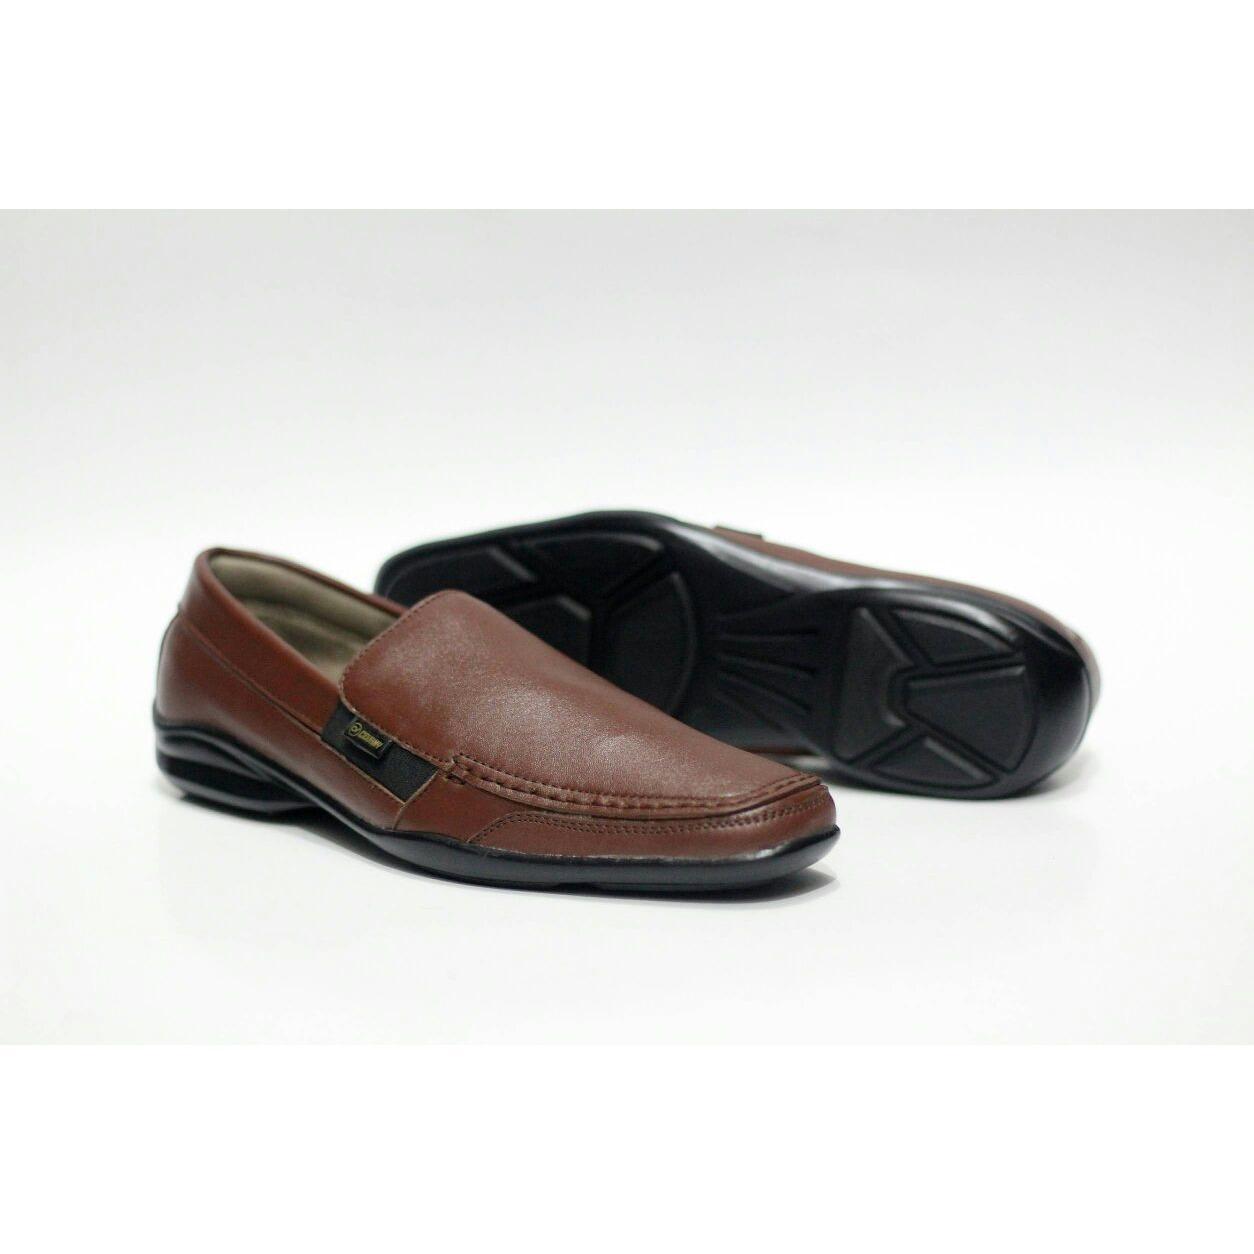 YAHLAMU - Sepatu Pantofel Formal Kulit CVNY HRABAL Pria / Sepatu kerja / Kickers / Bally / Yongki/ CEVANY